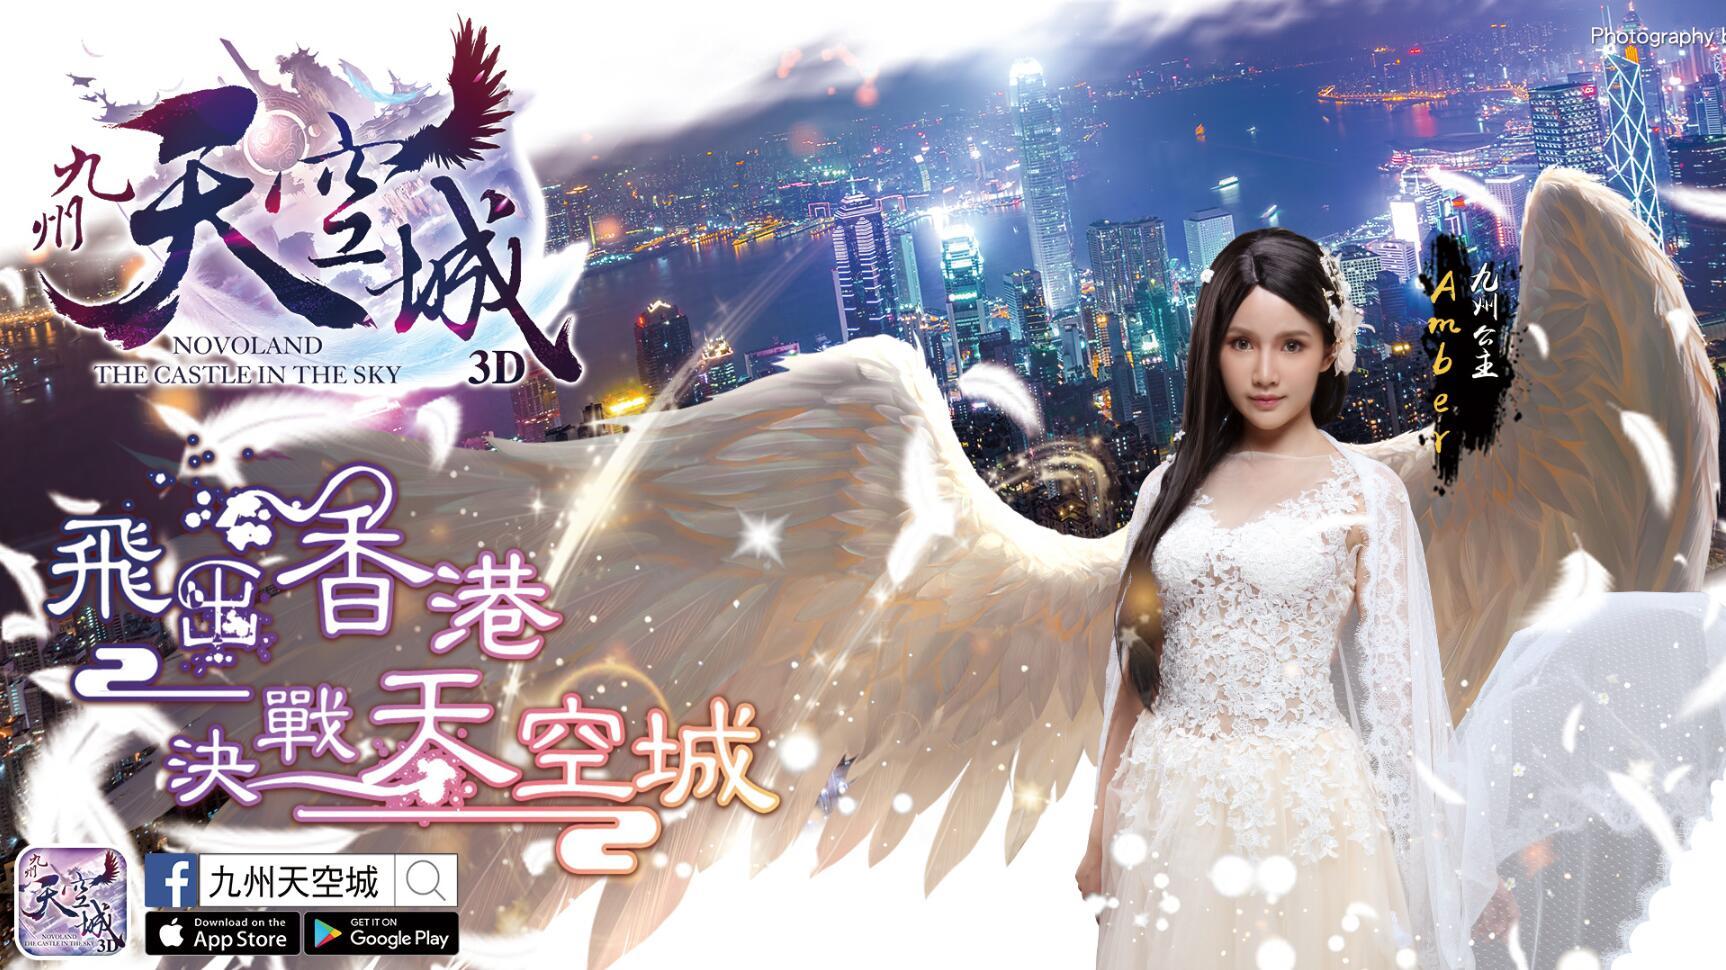 C:\Users\Yuen\Desktop\九州天空城香港新聞稿1003\05.jpg